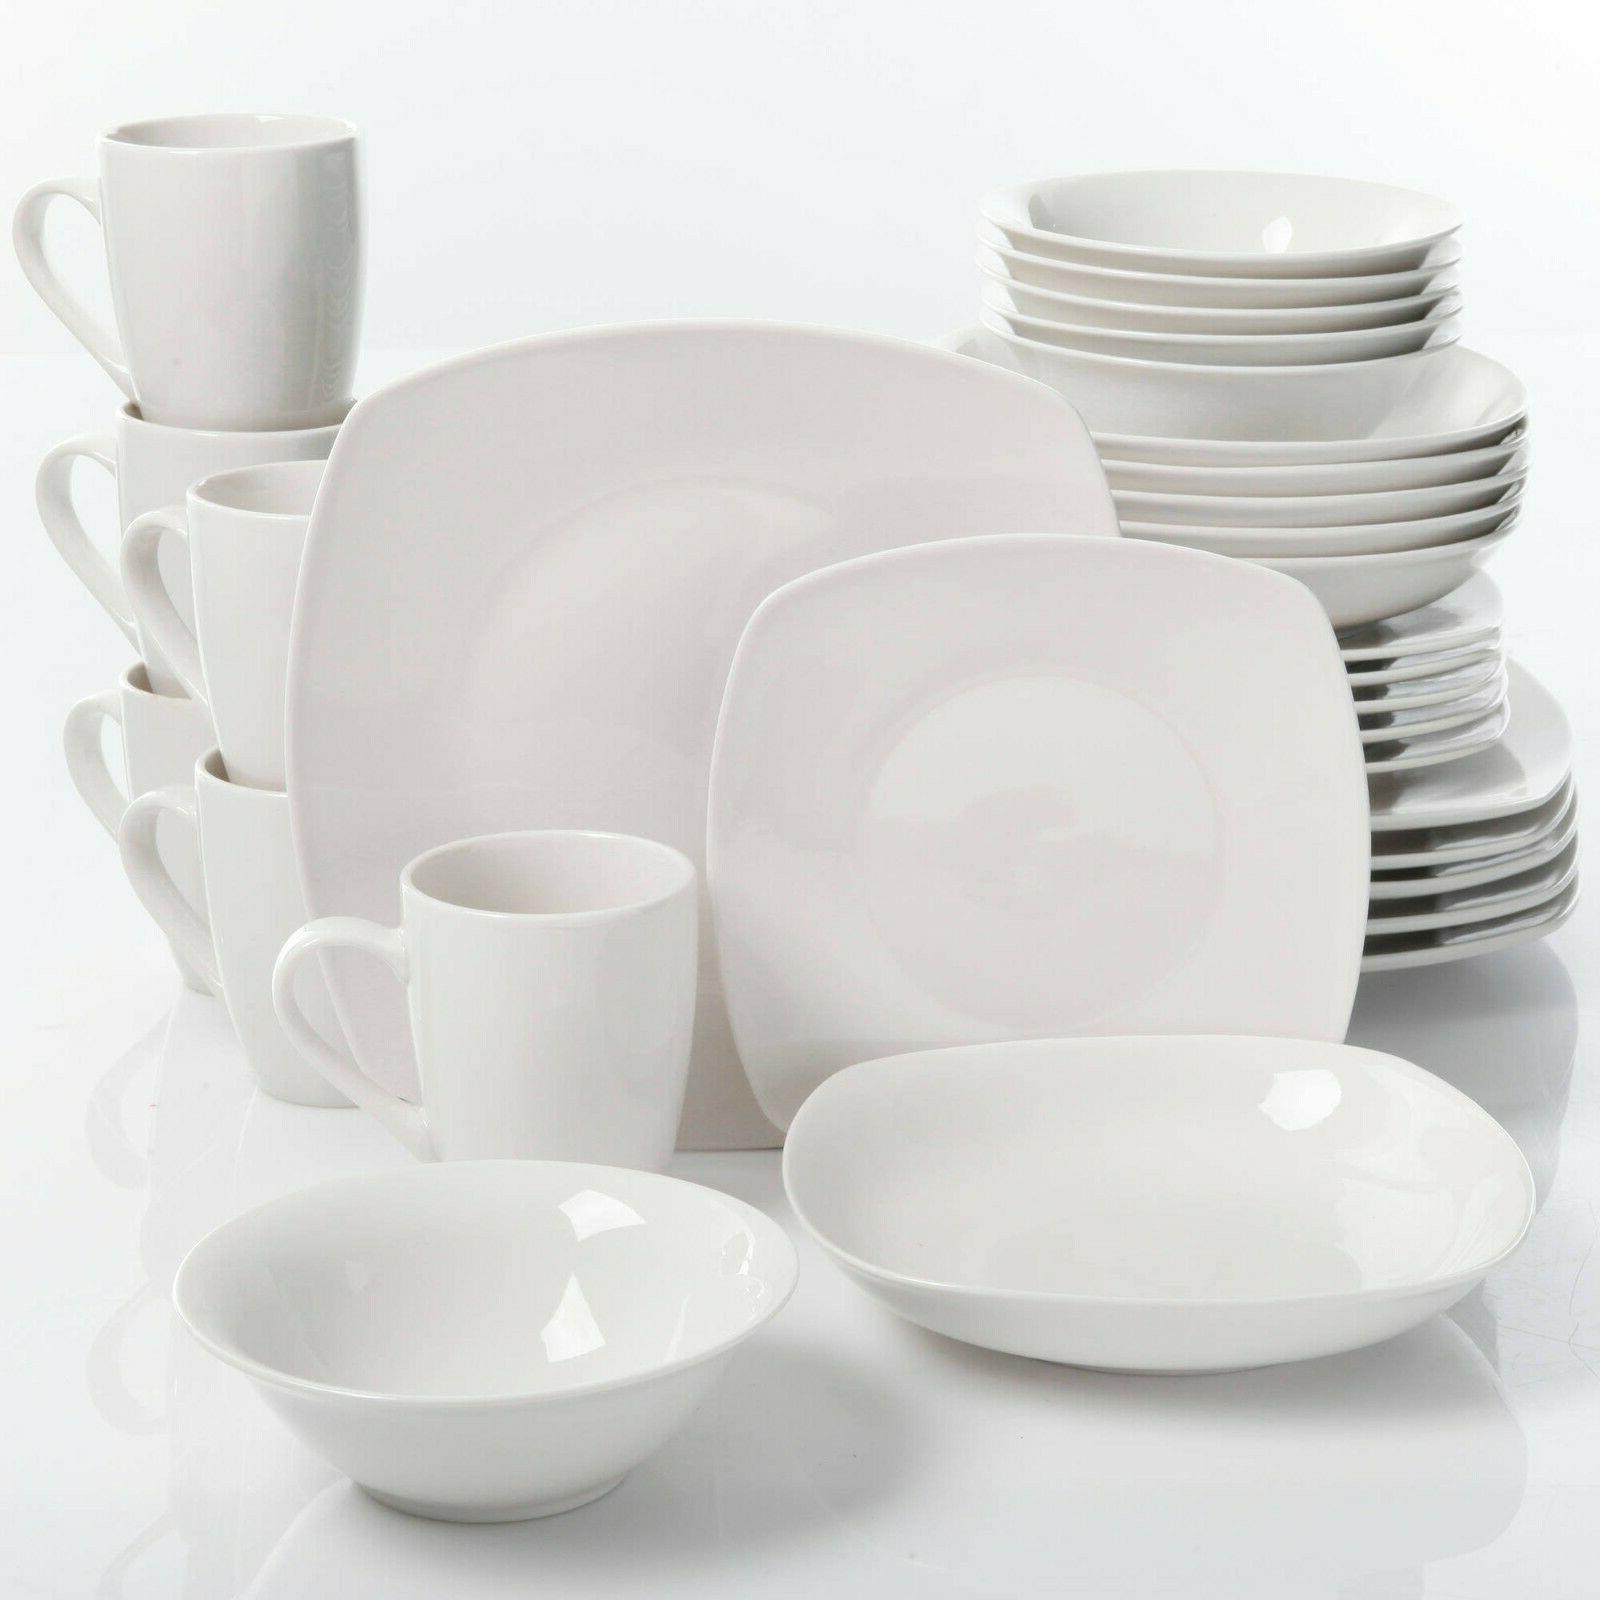 Porcelain Dinnerware Set 30-Piece Square Dinner Plates Dish